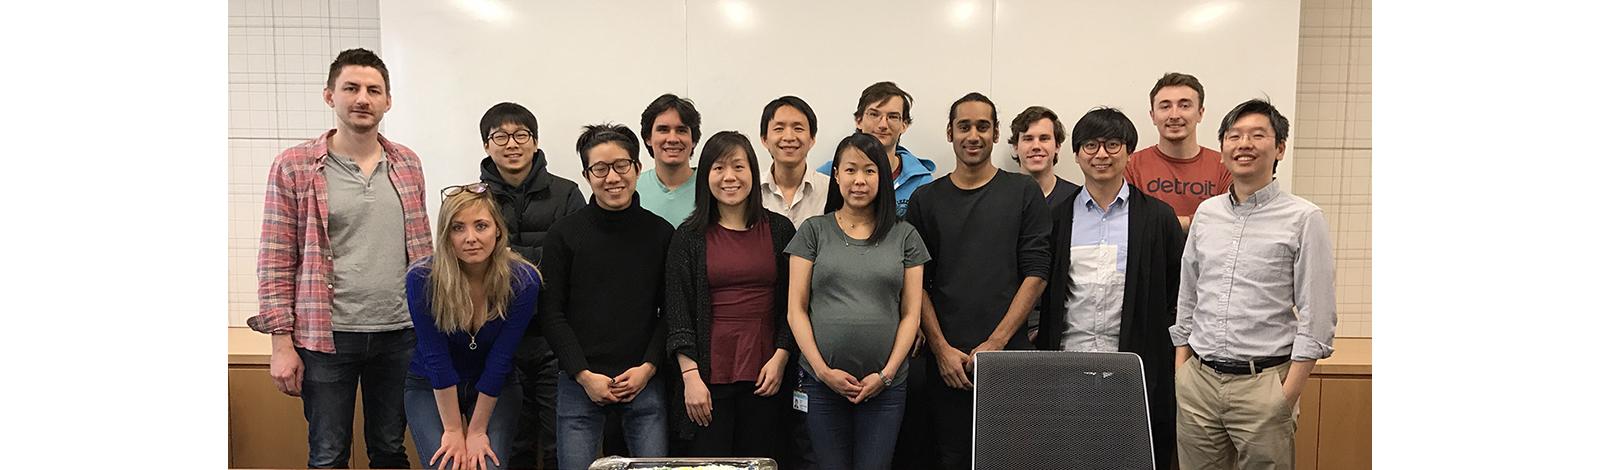 lab photo spring 2017.jpg